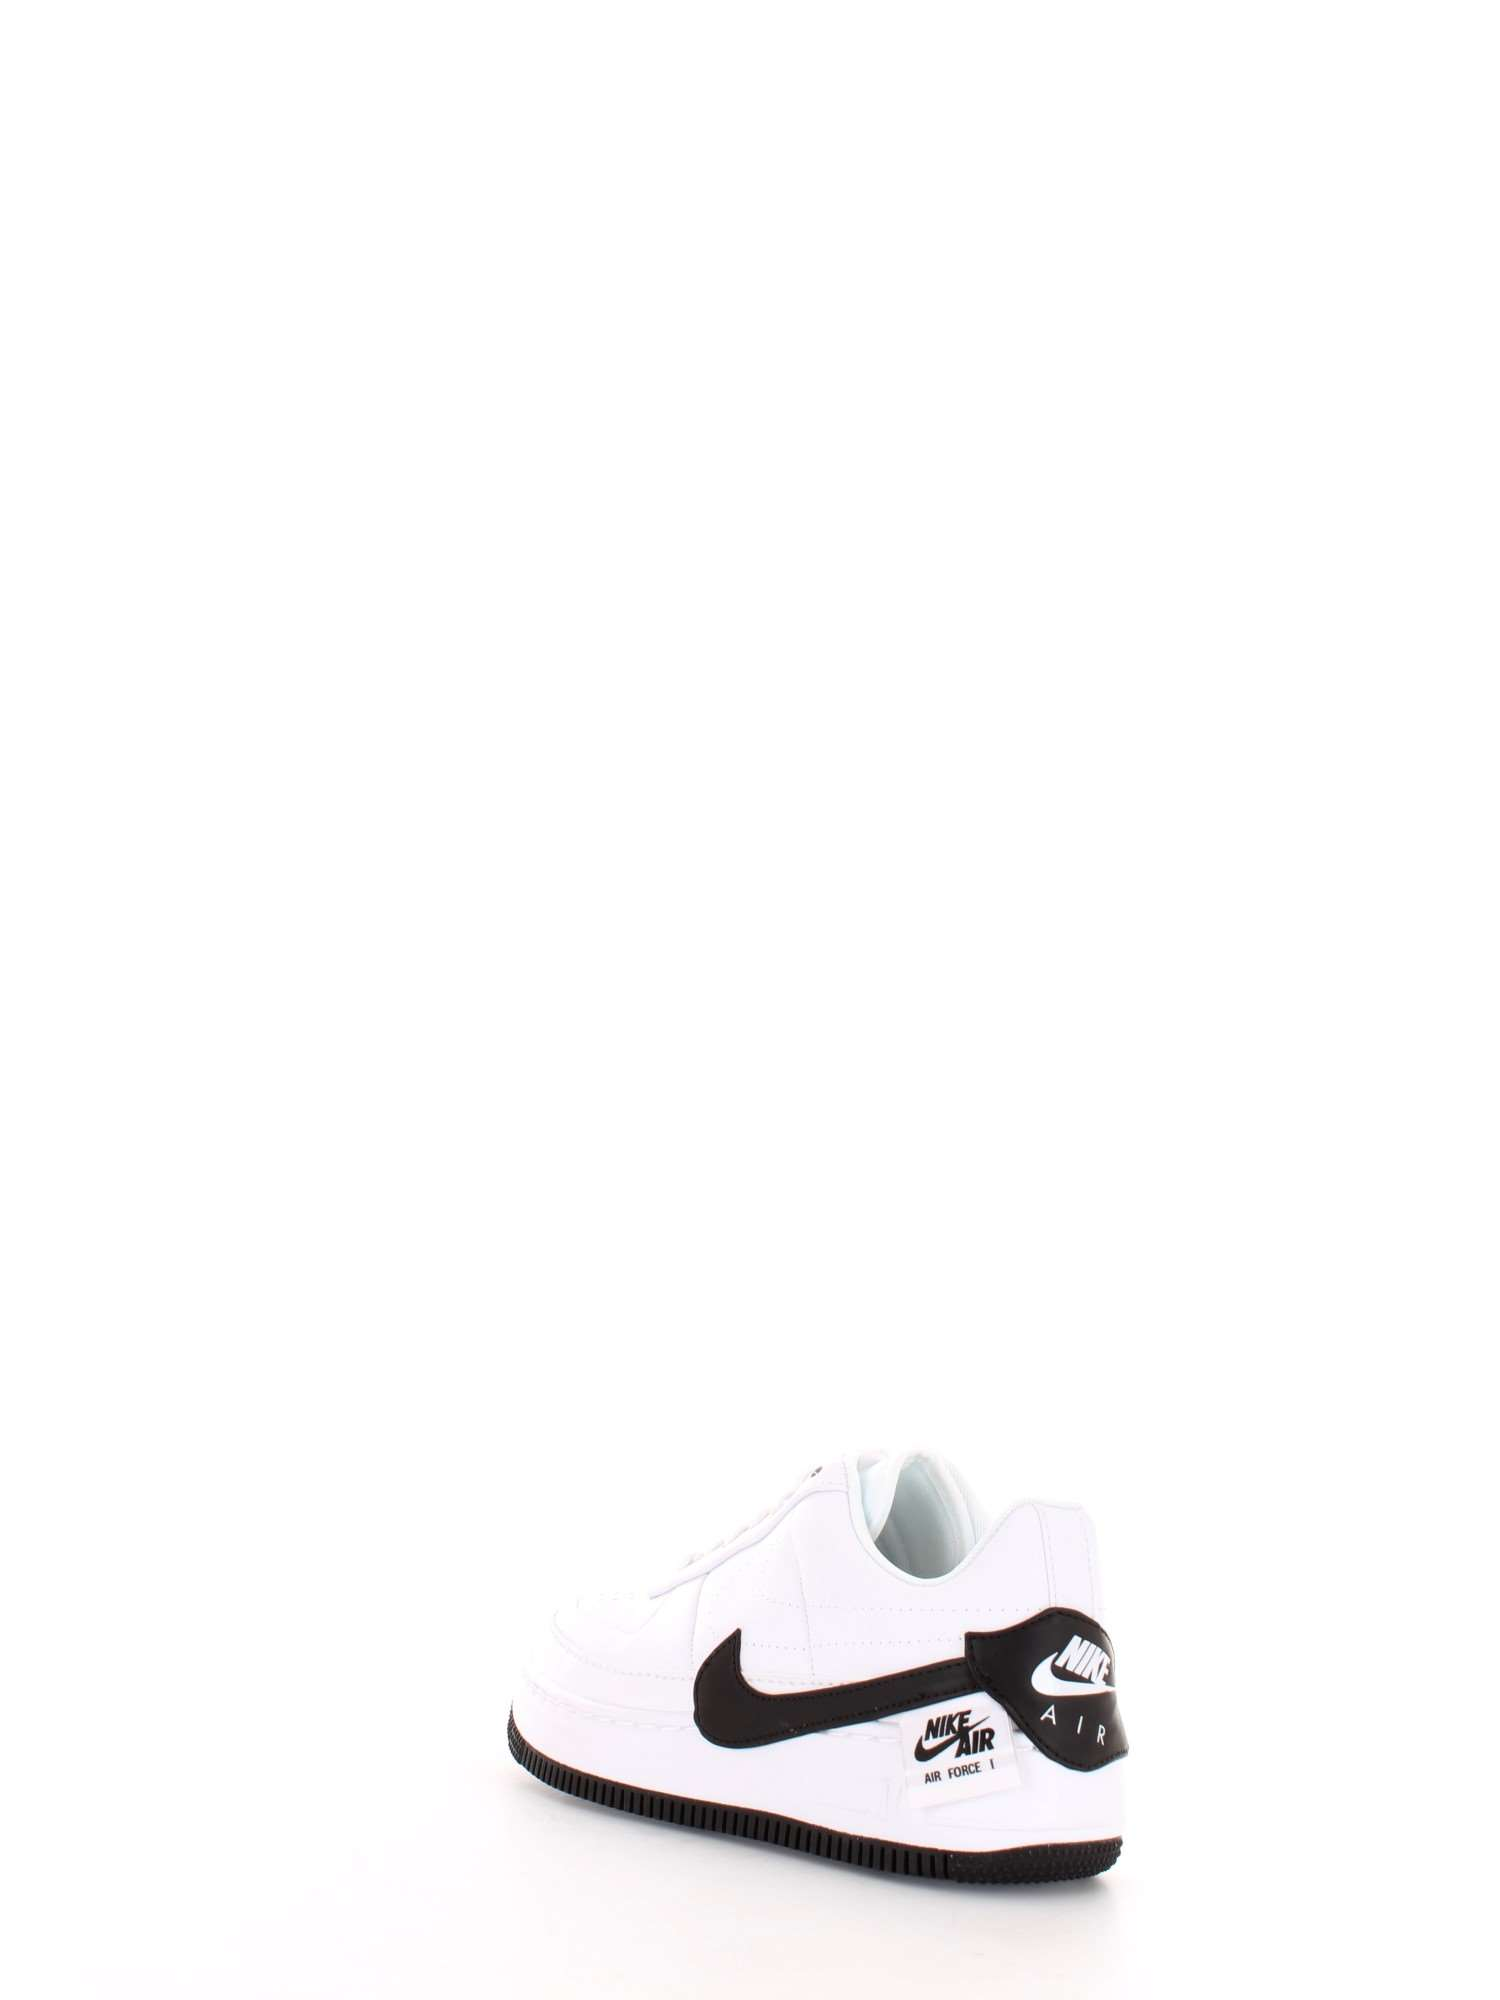 estate 102 Primavera Uomo Nike Sneakers Ao1220 Bianco TYBwnBqA6